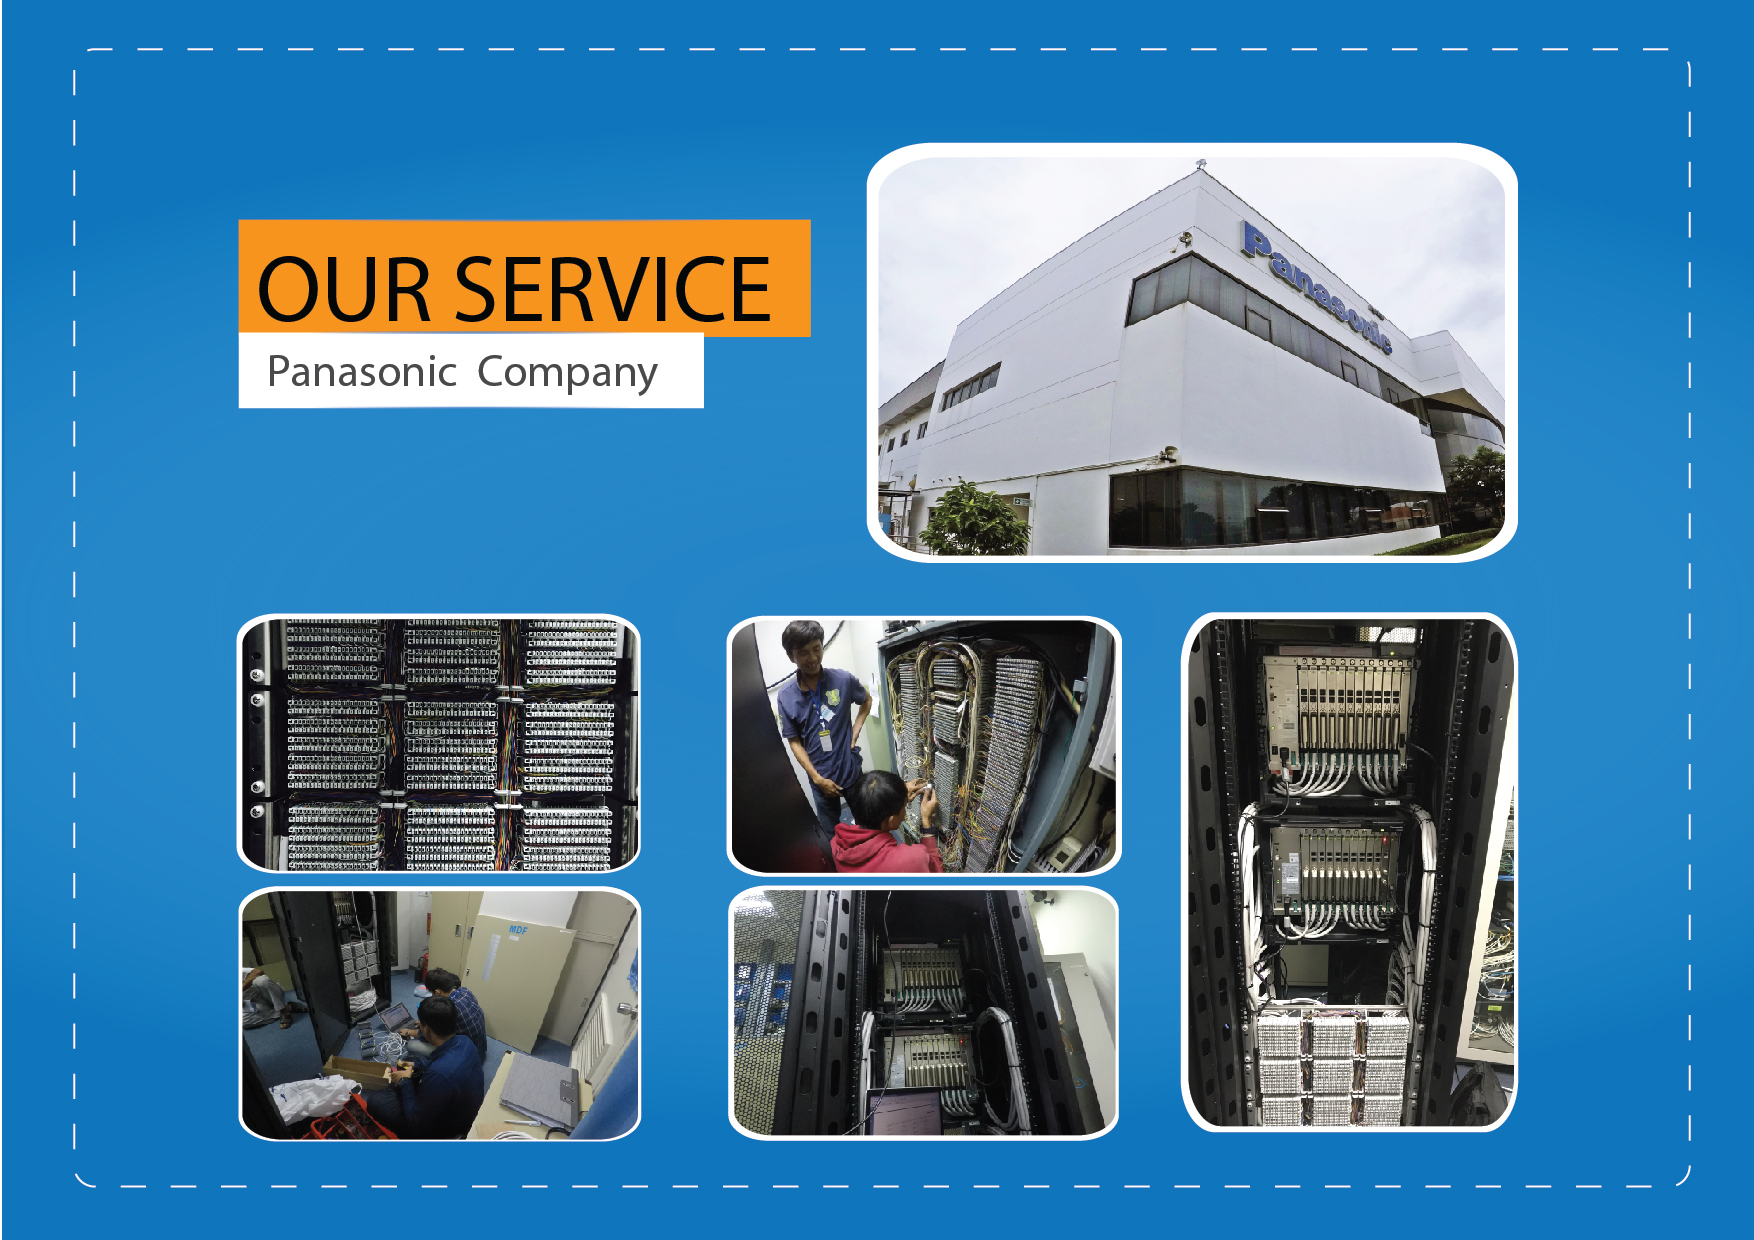 our service Panasonic edit a4-01